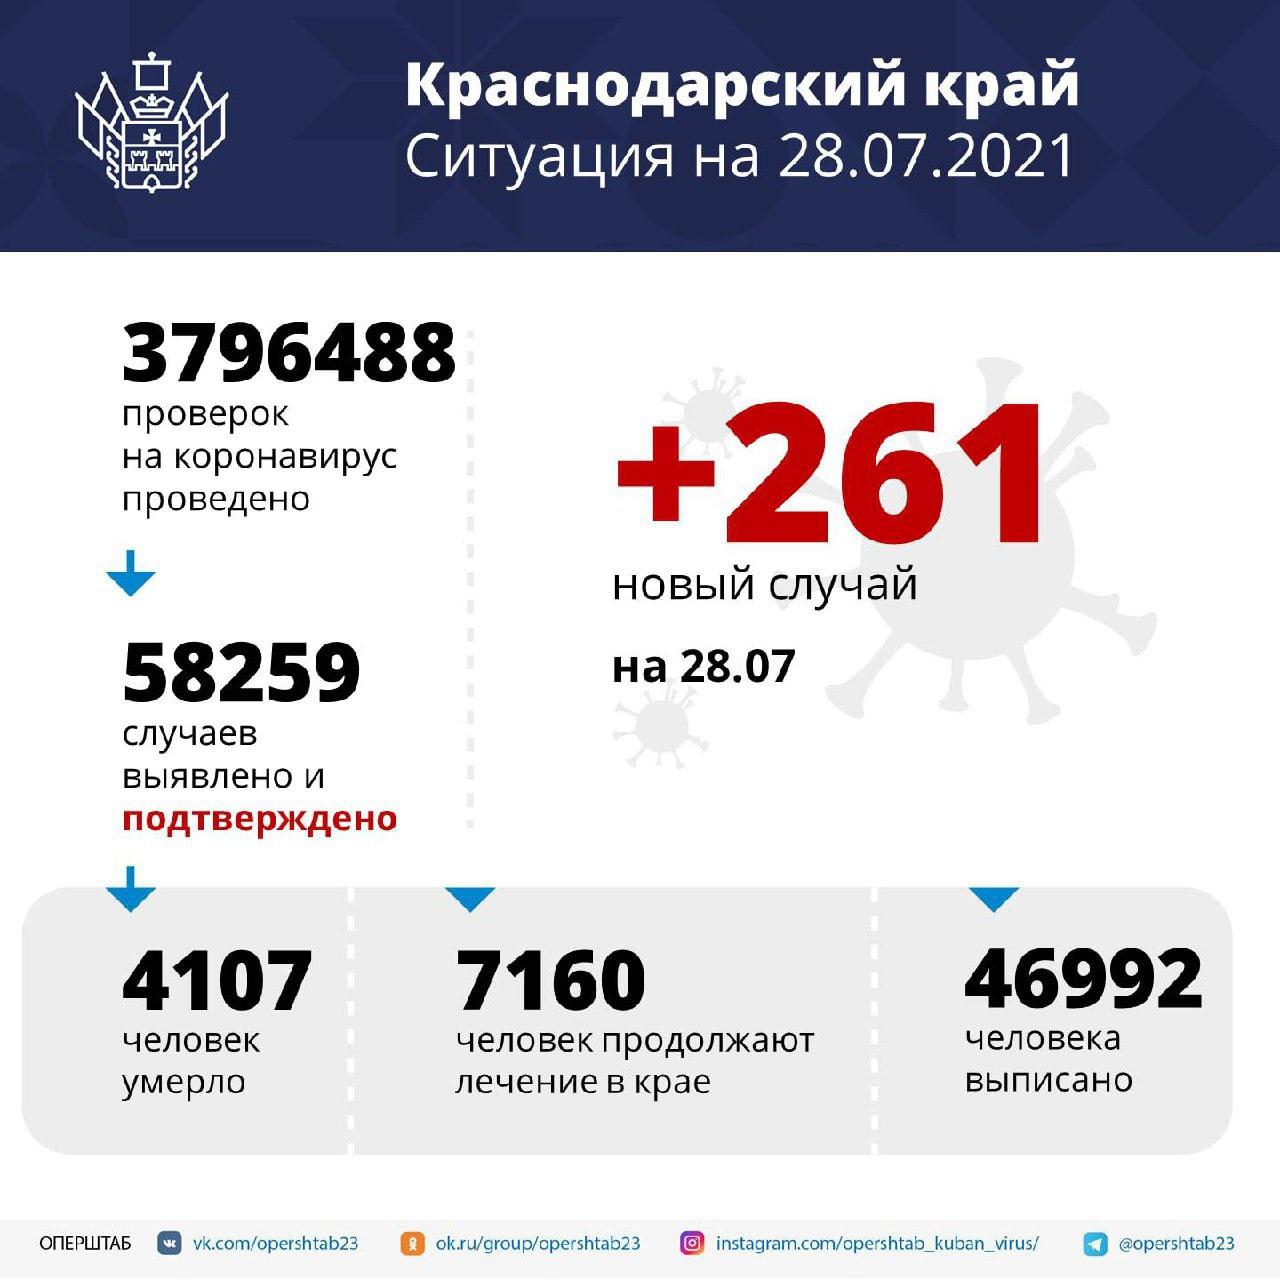 На Кубани за сутки зарегистрировали 261 случай COVID-19Заболевших...